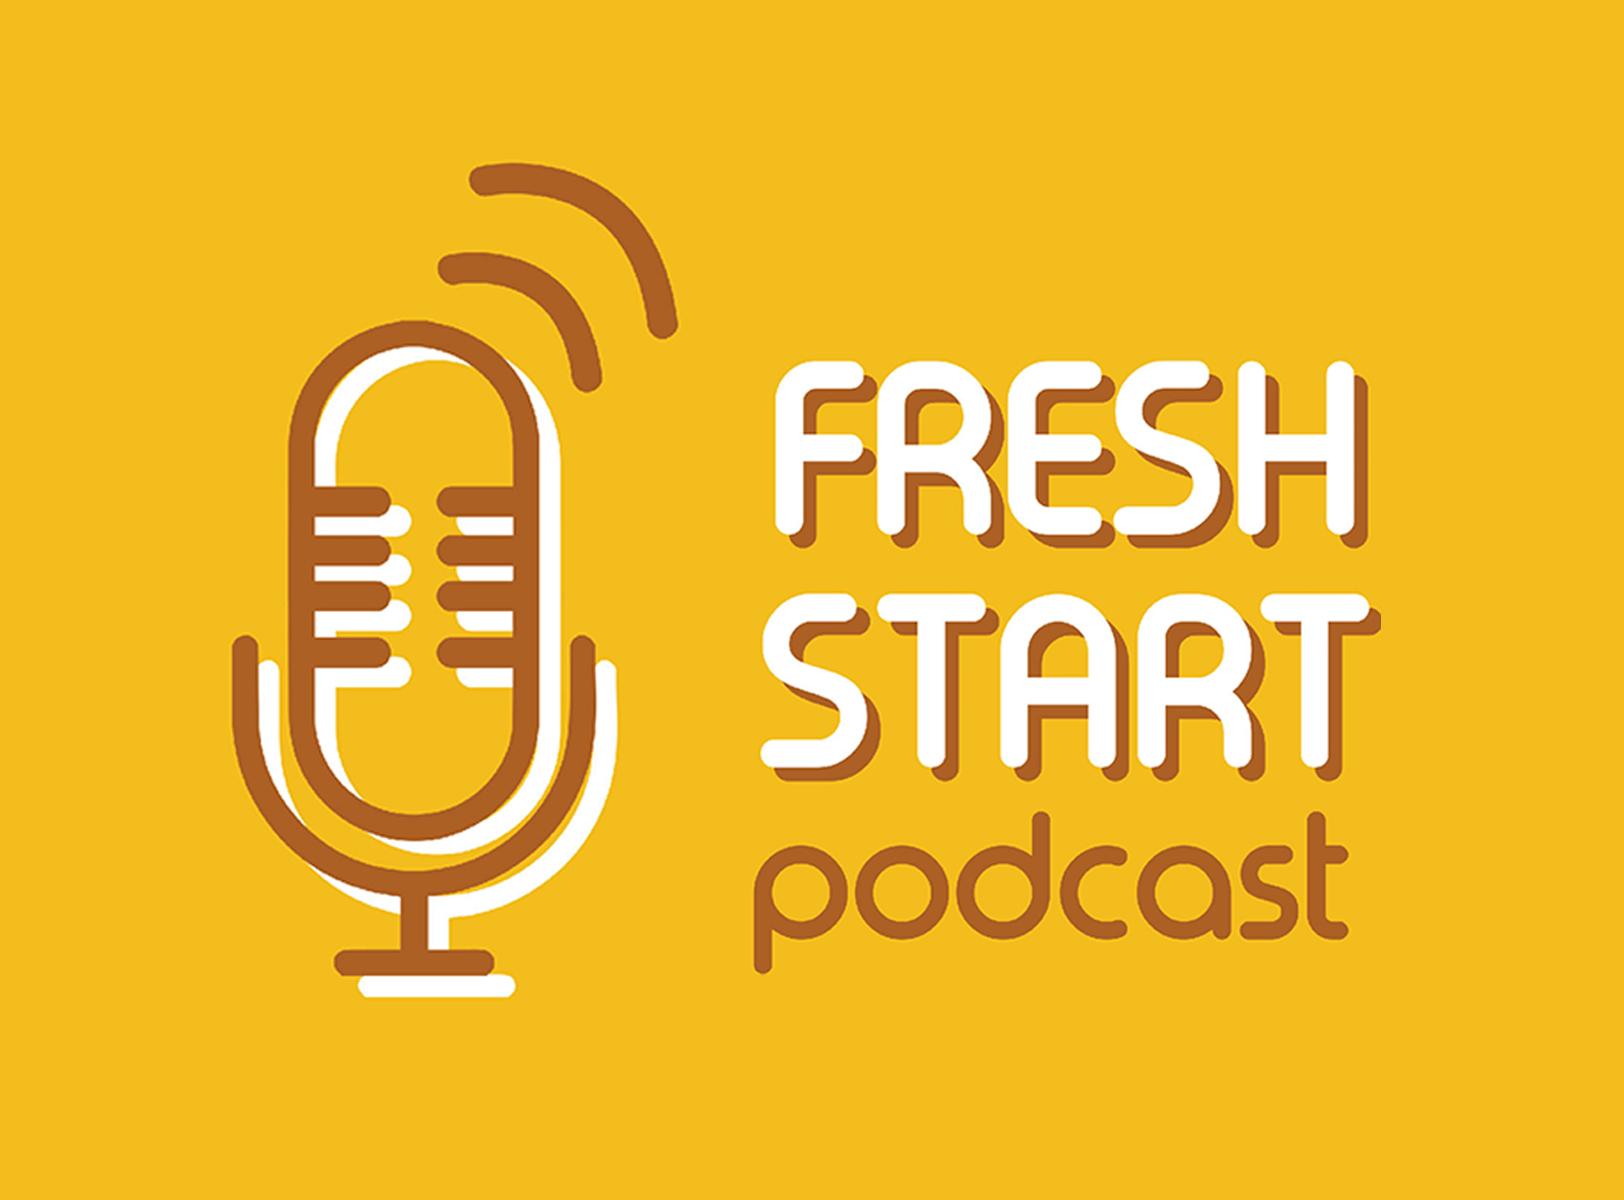 Fresh Start: Podcast News (11/11/2019 Mon.)